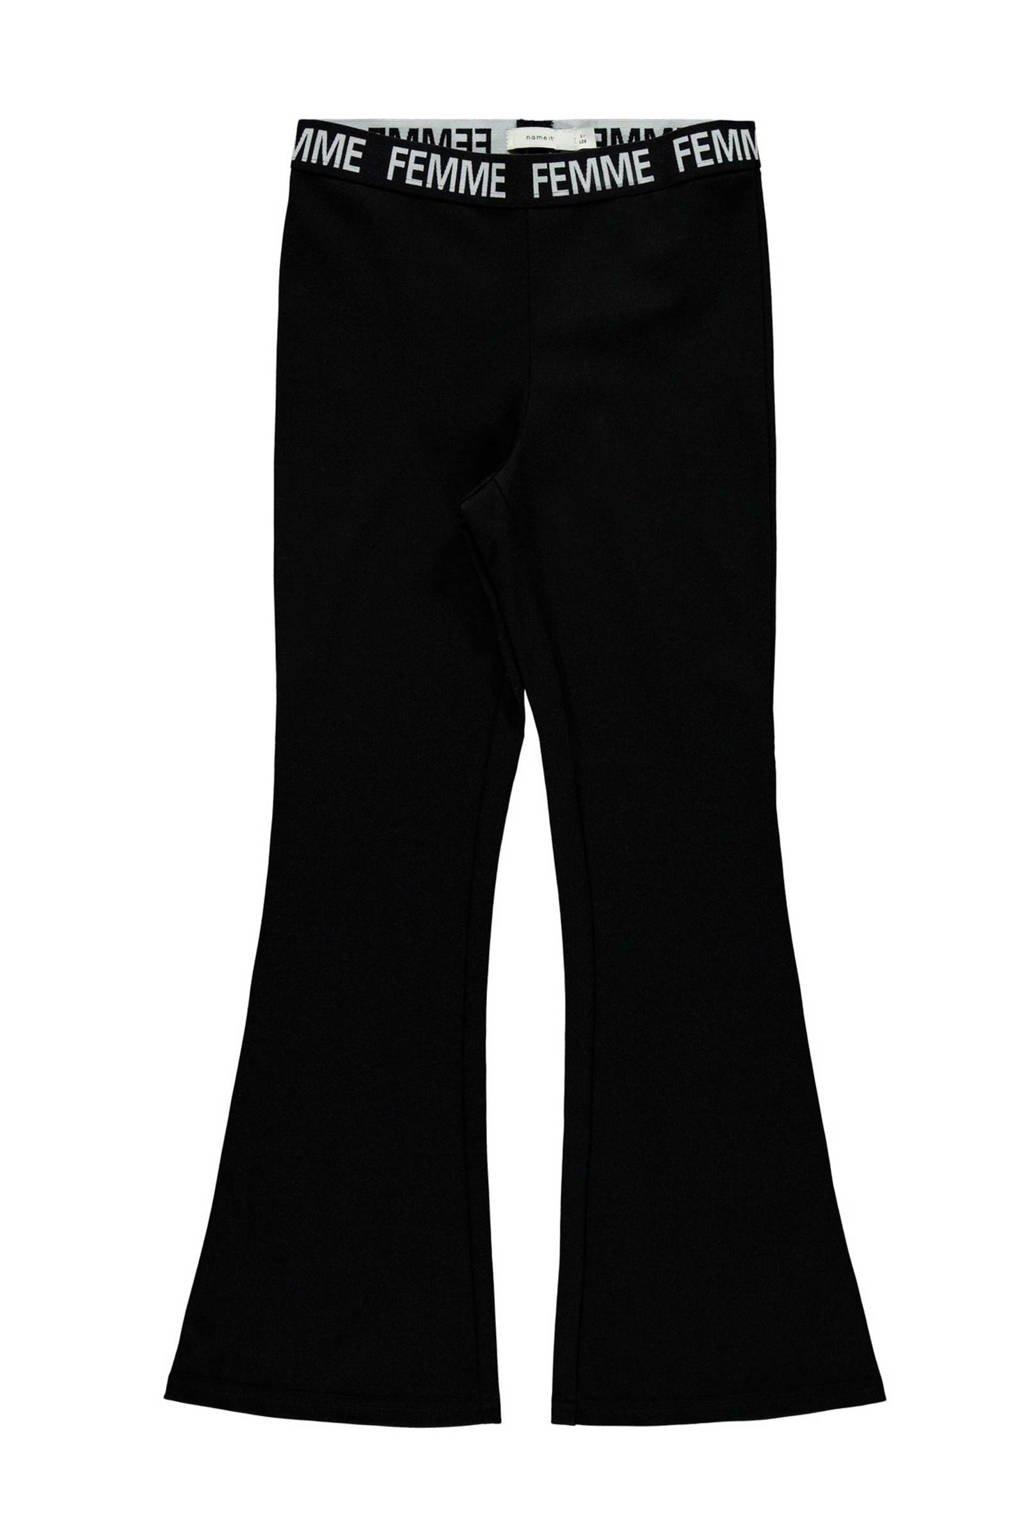 NAME IT KIDS bootcut broek Mira zwart, Zwart